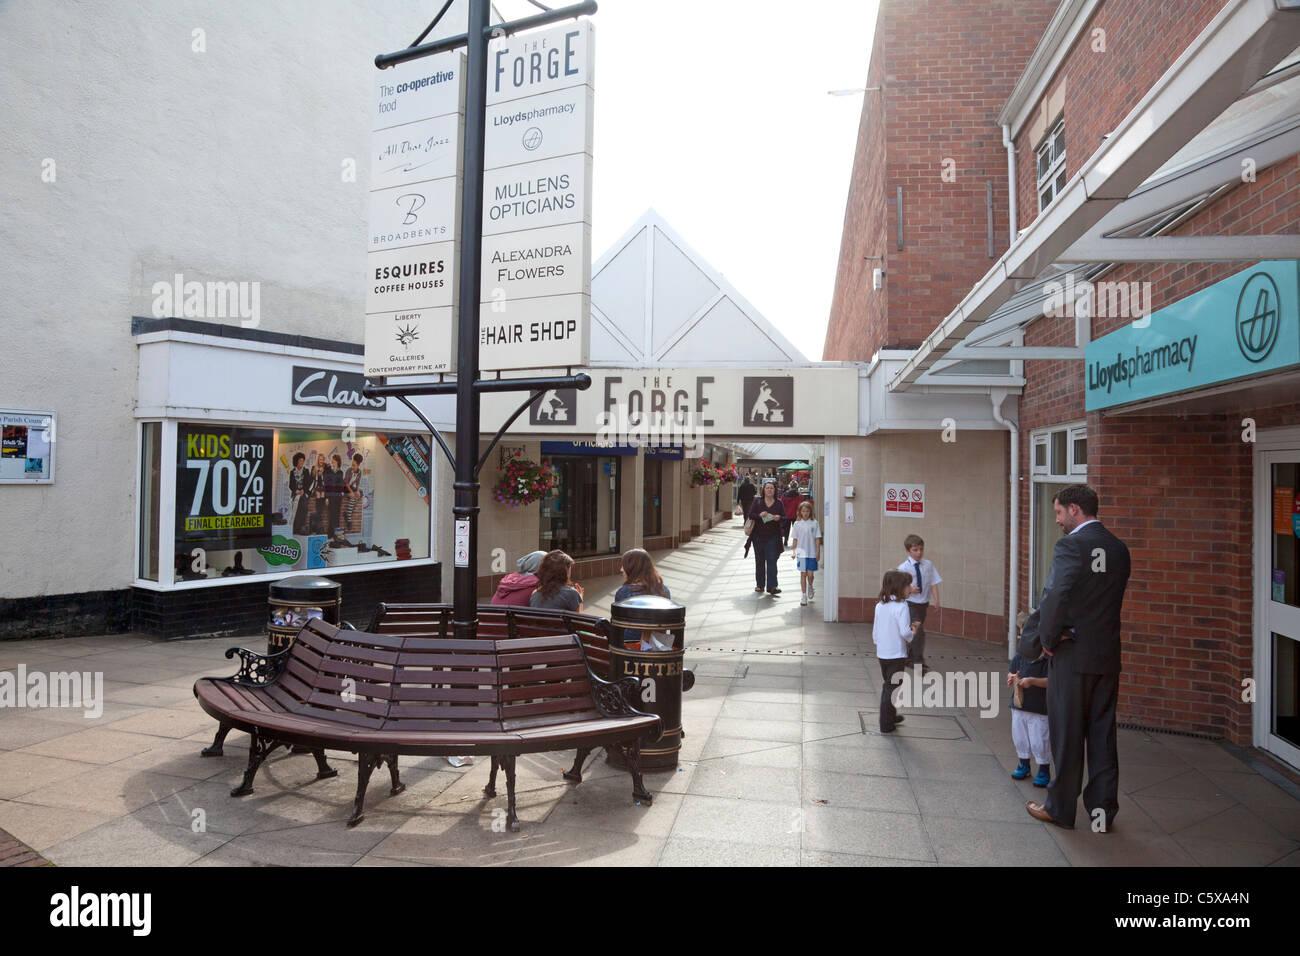 The Forge shopping centre, Stockton Heath, Cheshire - Stock Image